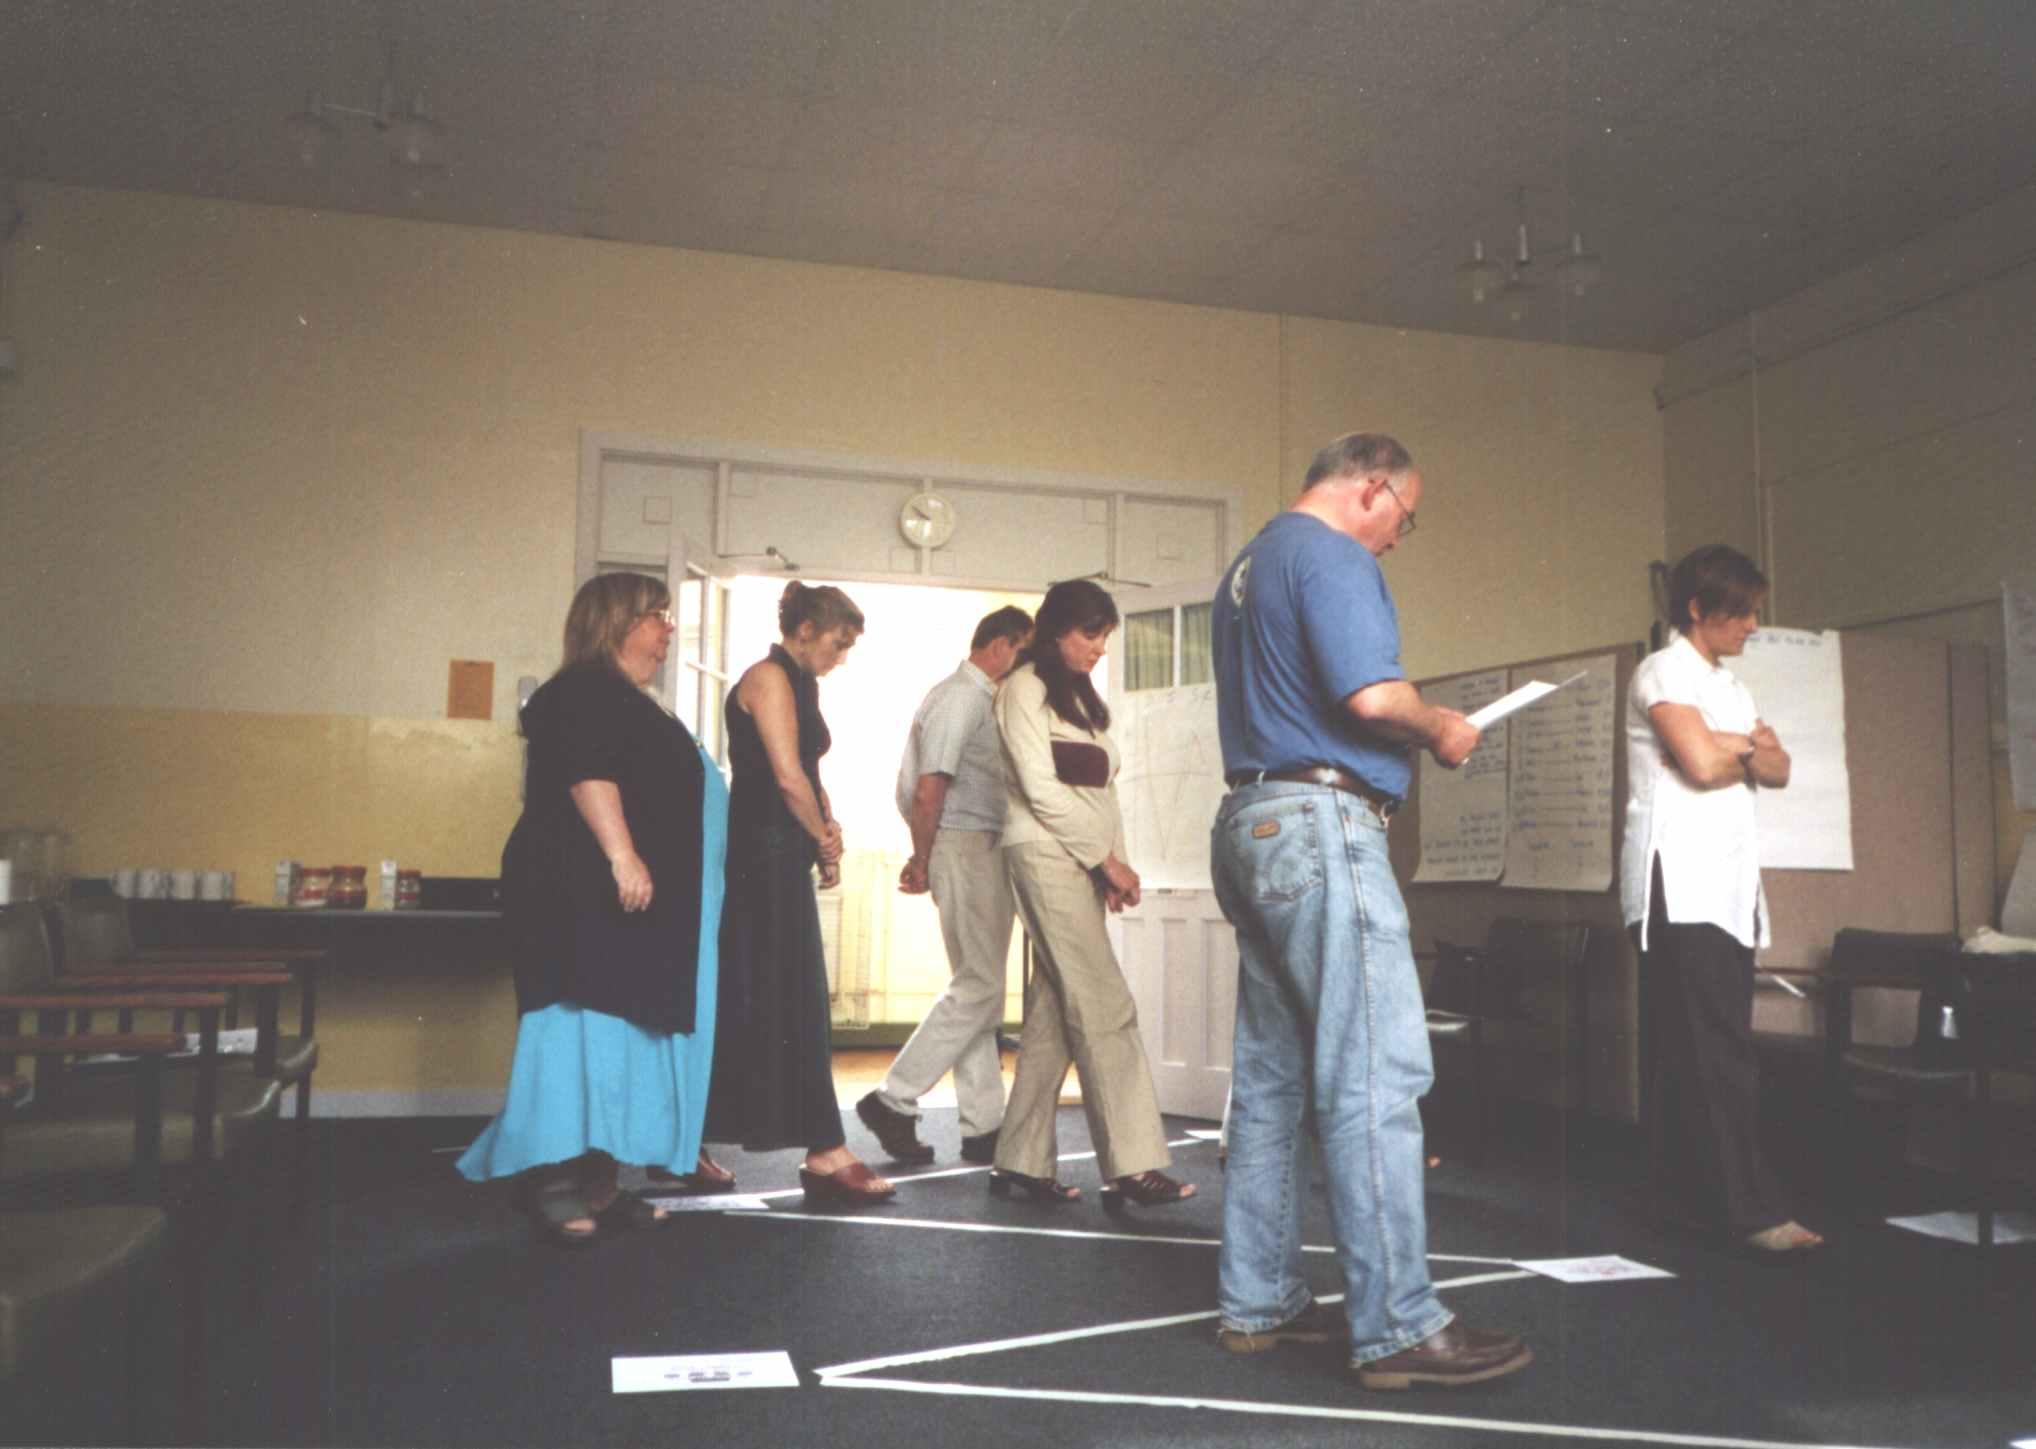 June 2003: Gina Holdsworth, Melanie Hunter (The Zone) Tony Cosgrove (Nortech Services Ltd, Hull), Angela Lambert-Dowell and Deb Tate (Hull City Vision) 'walking the Spiral', June 2003 (Helen Ezard)